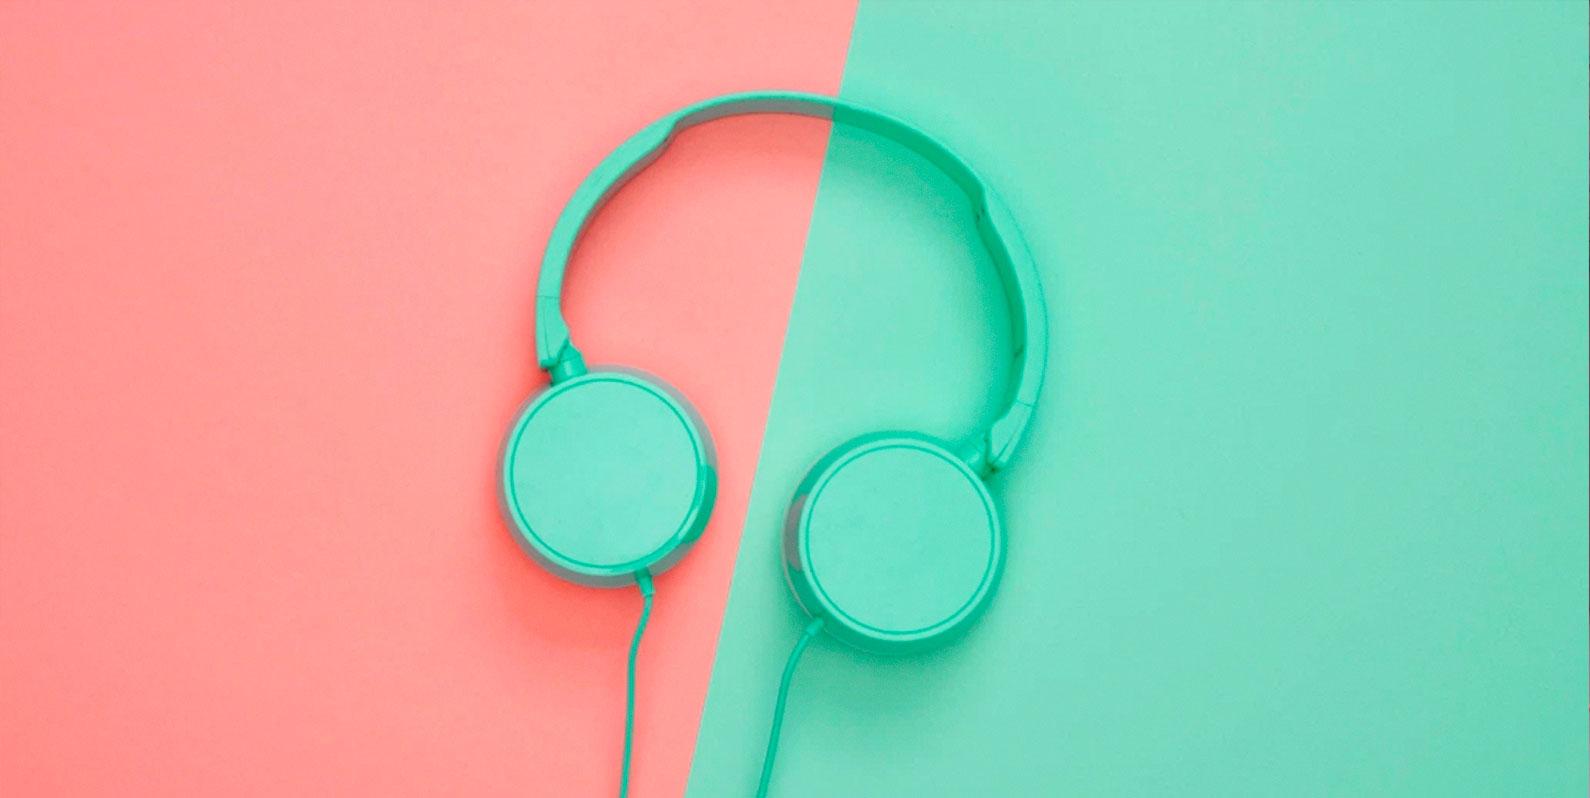 O futuro das redes sociais pode ser o áudio